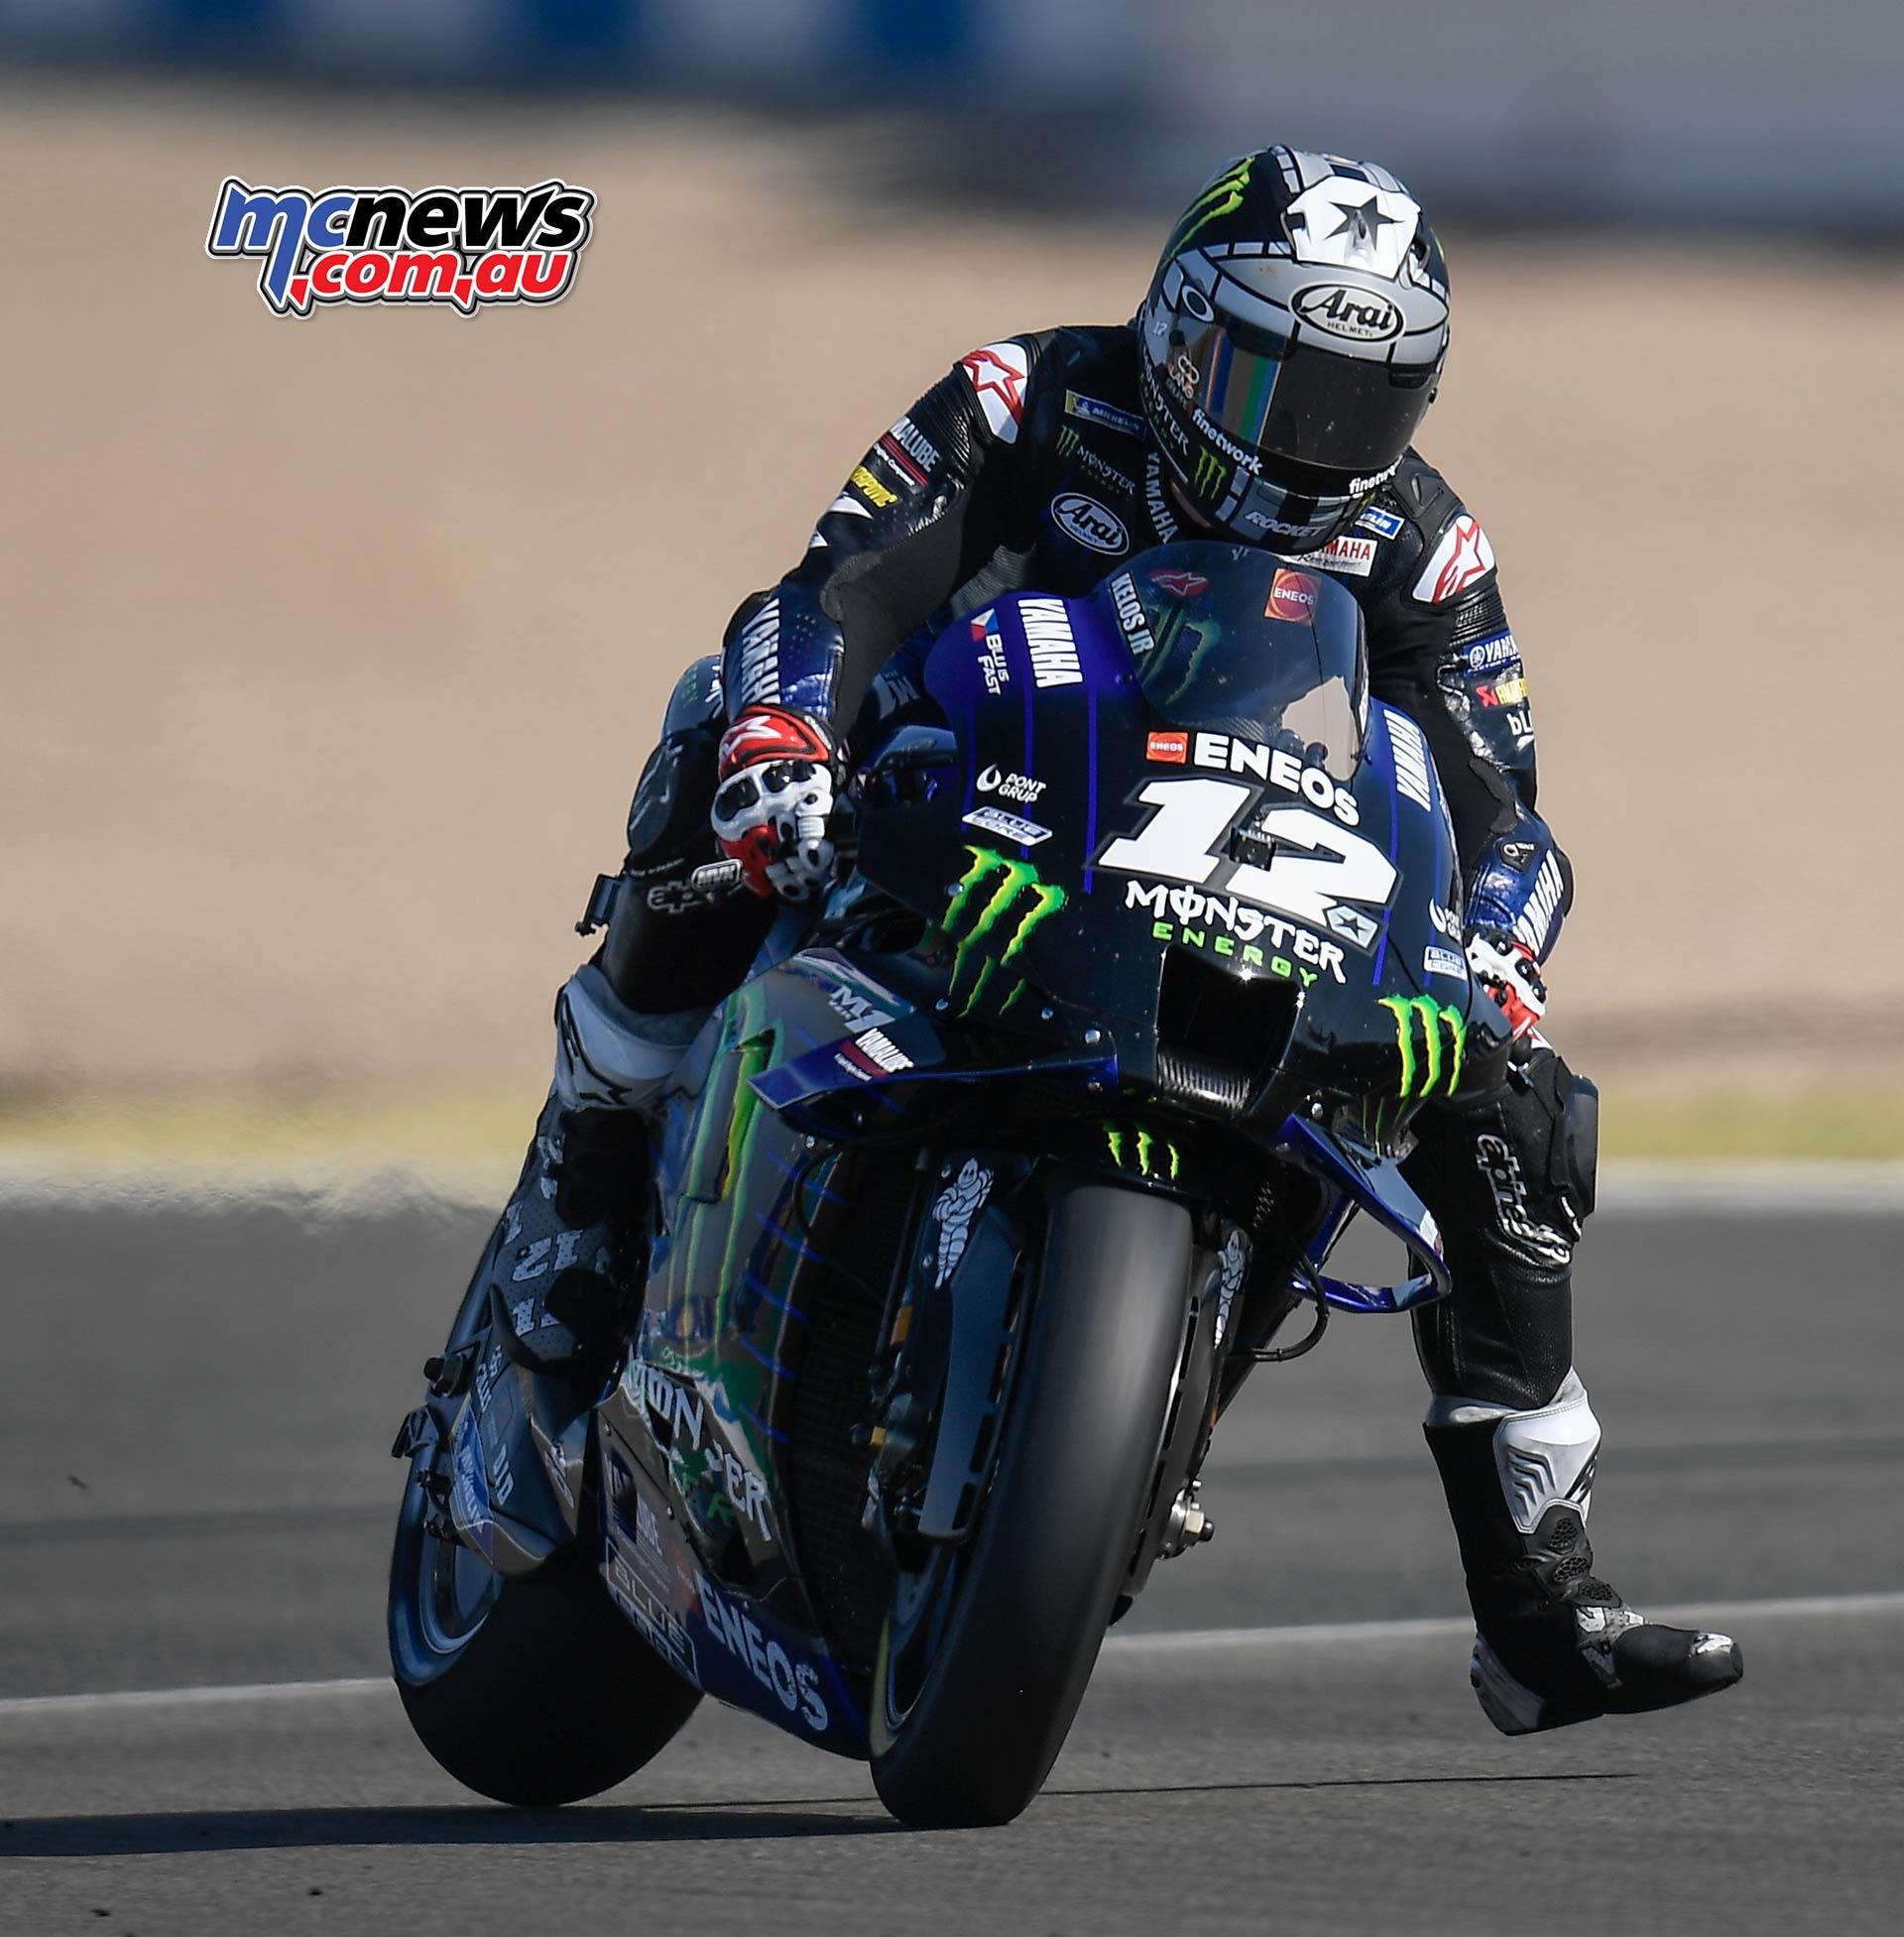 Vinales tops FP3 with new lap record | Marc P20 | MCNews.com.au